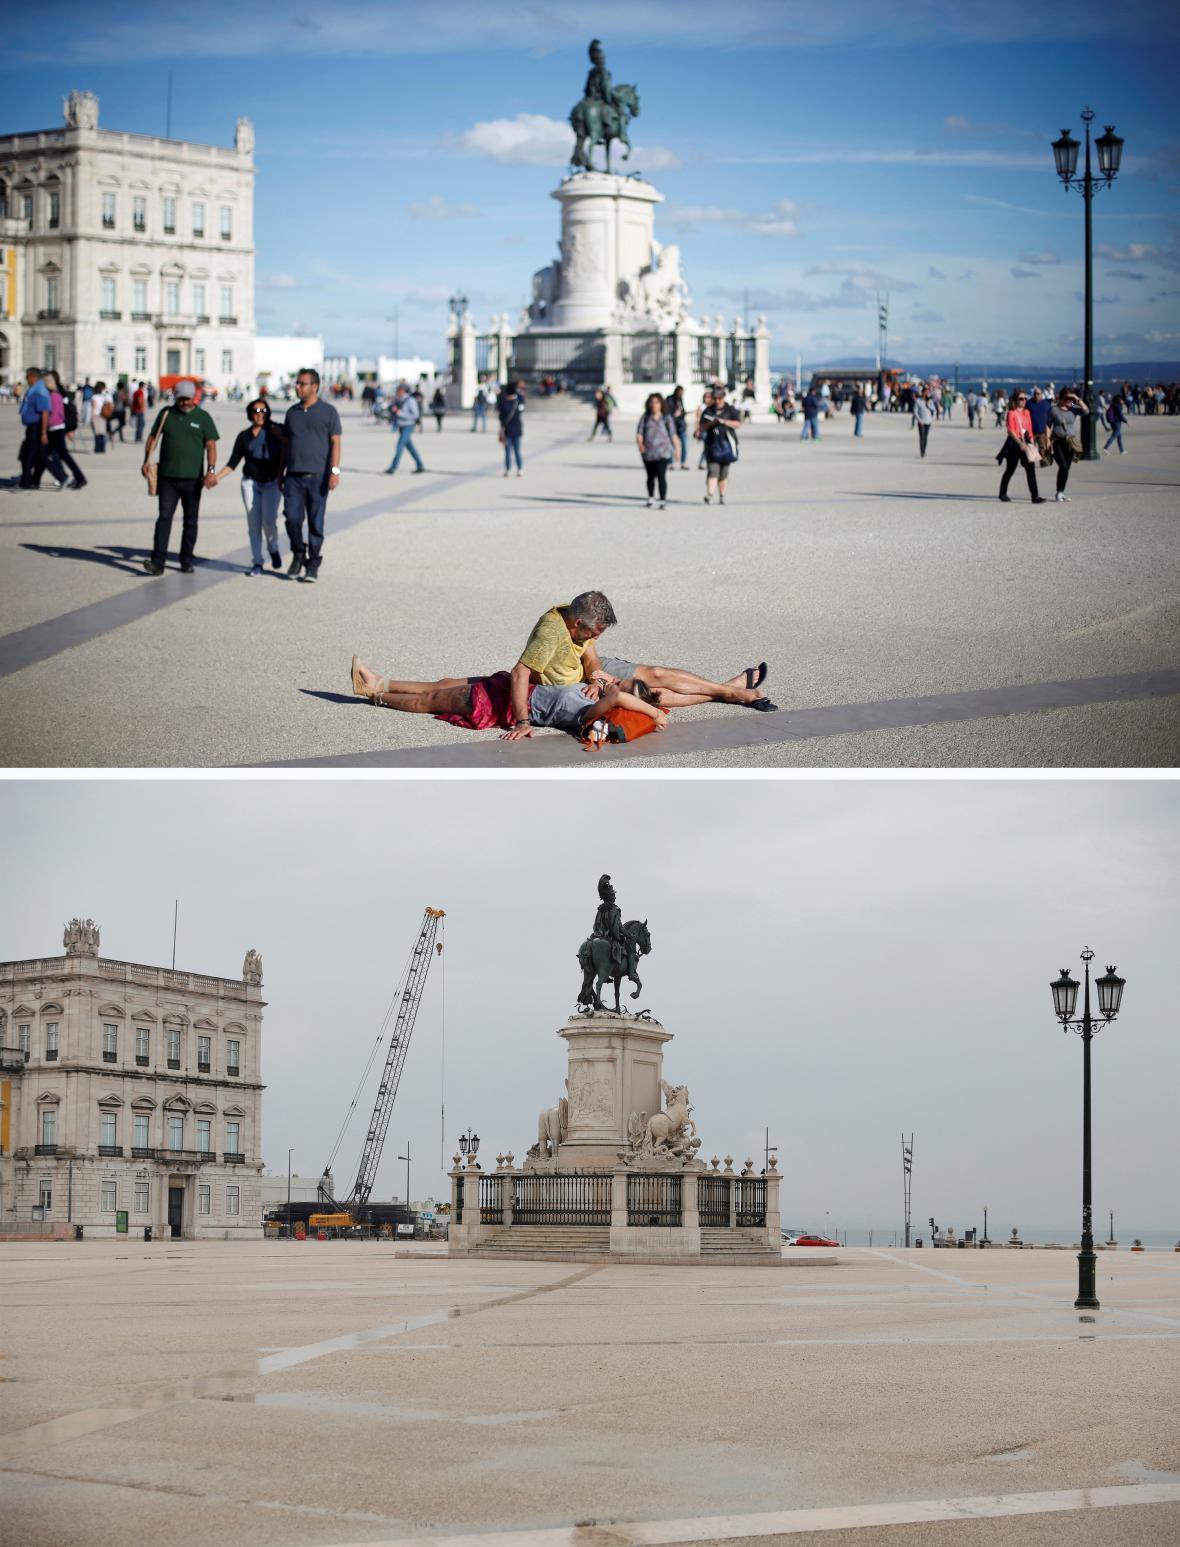 Karanténa vylidnila centrum Lisabonu